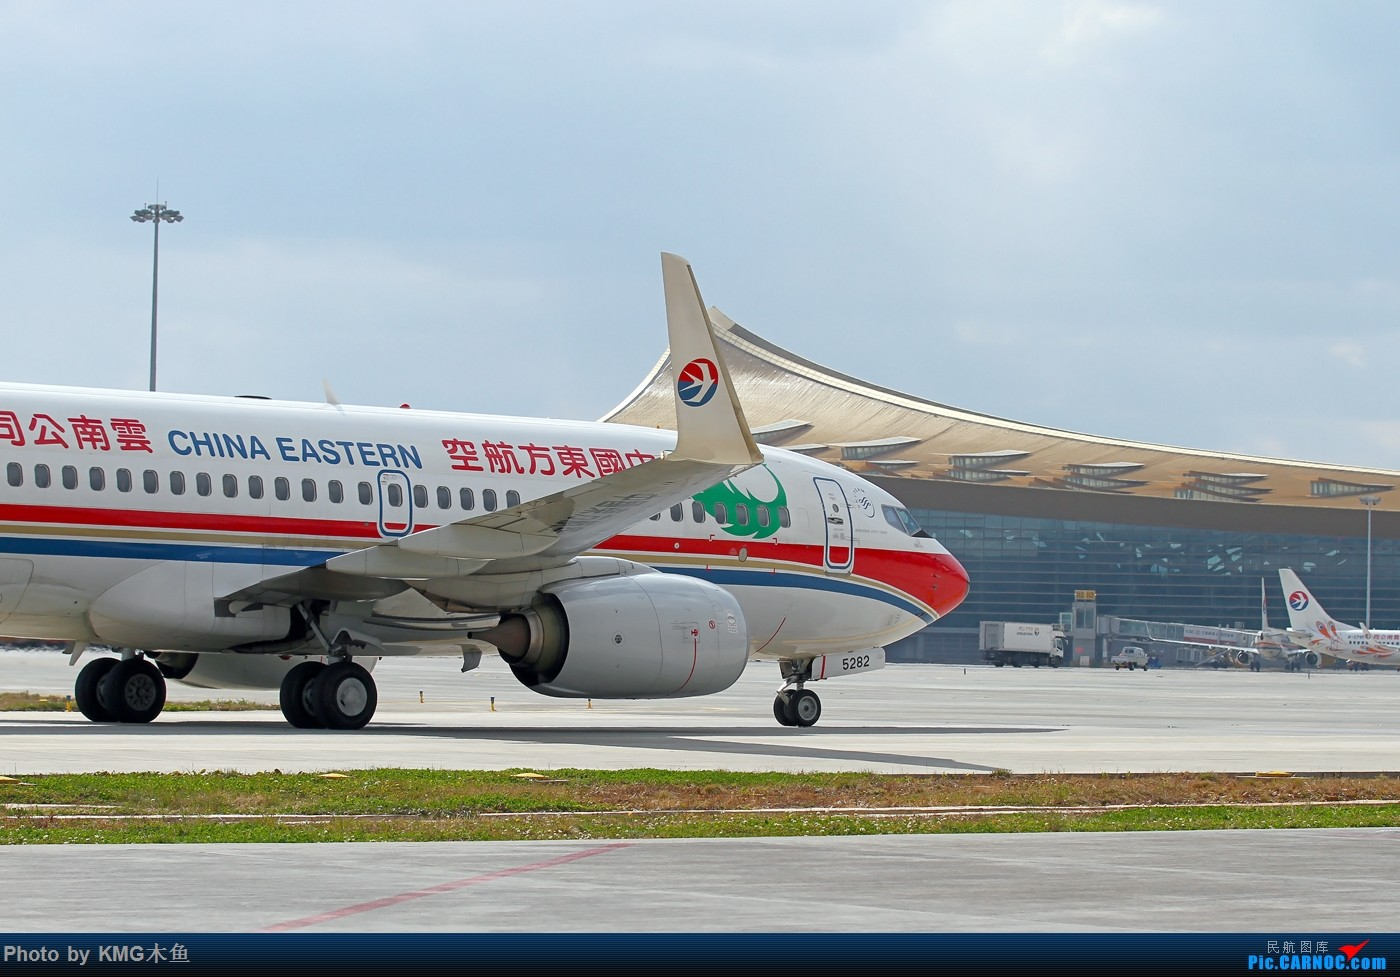 Re:[原创]【KMG昆明长水国际机场】昆明机场地面的精灵们 BOEING 737-700 B-5282 中国昆明长水国际机场机场